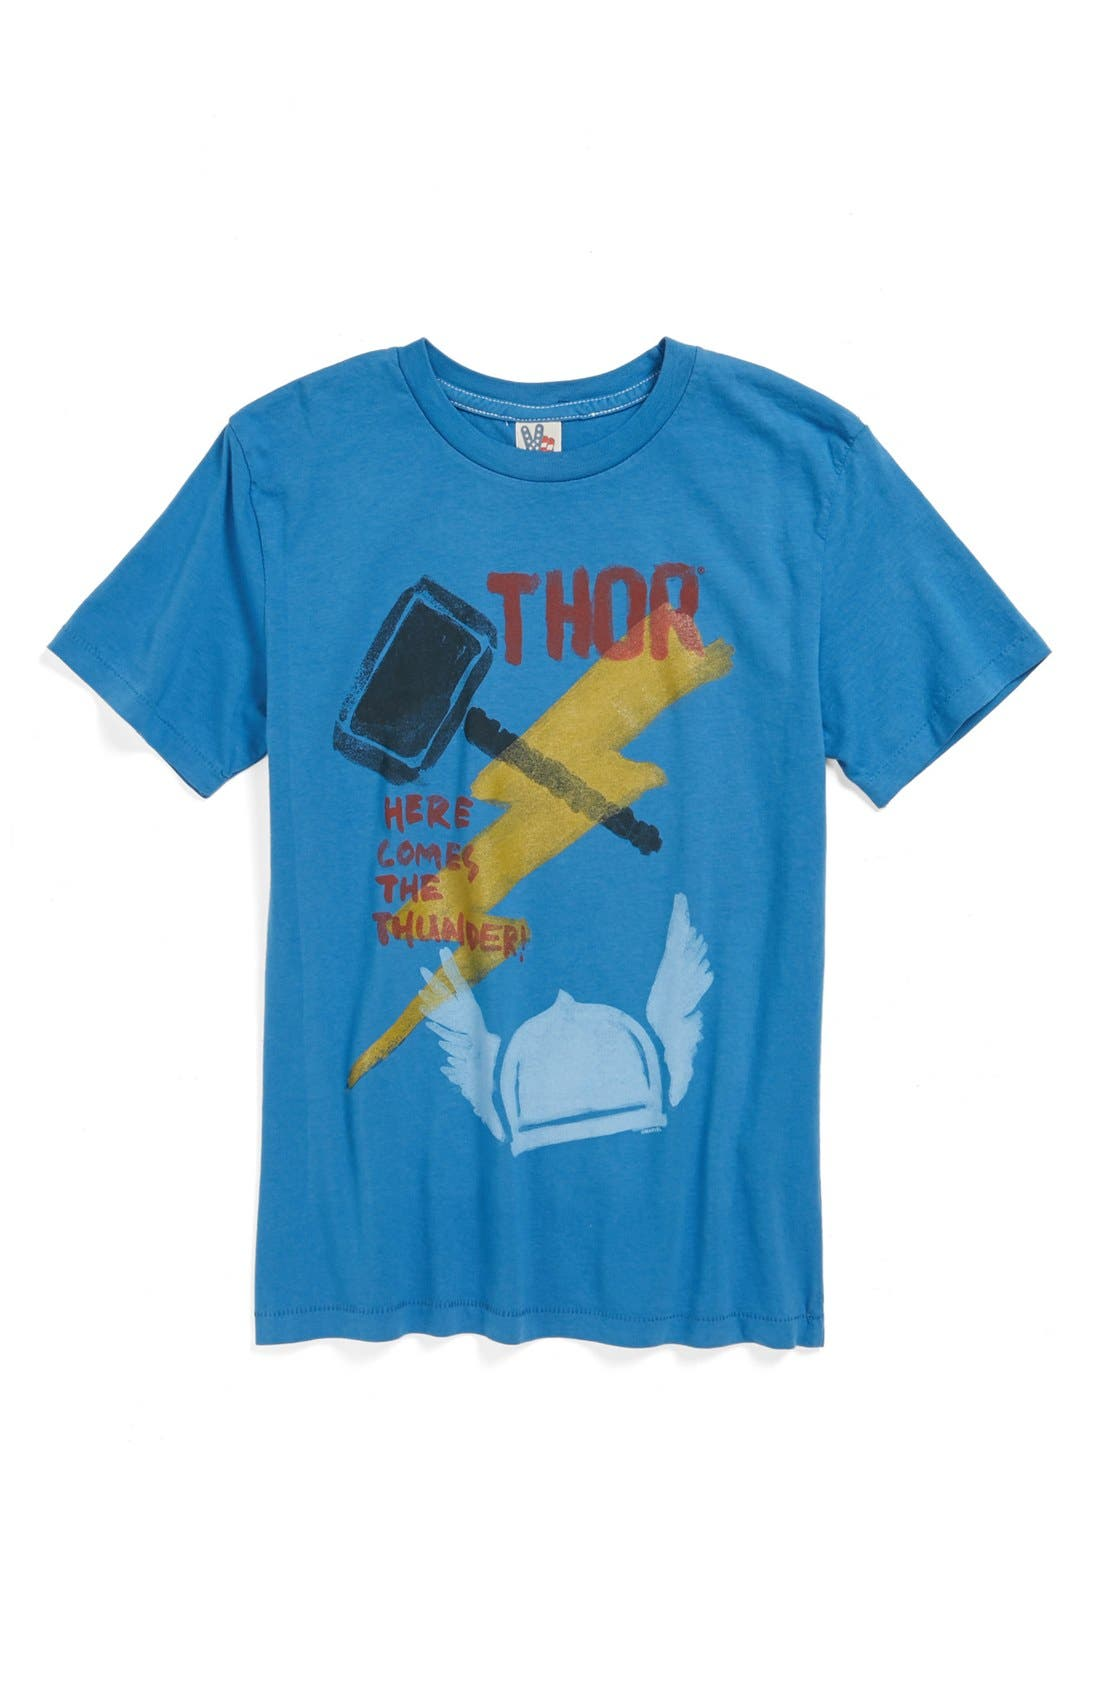 Alternate Image 1 Selected - Junk Food 'Thor' T-Shirt (Little Boys & Big Boys)